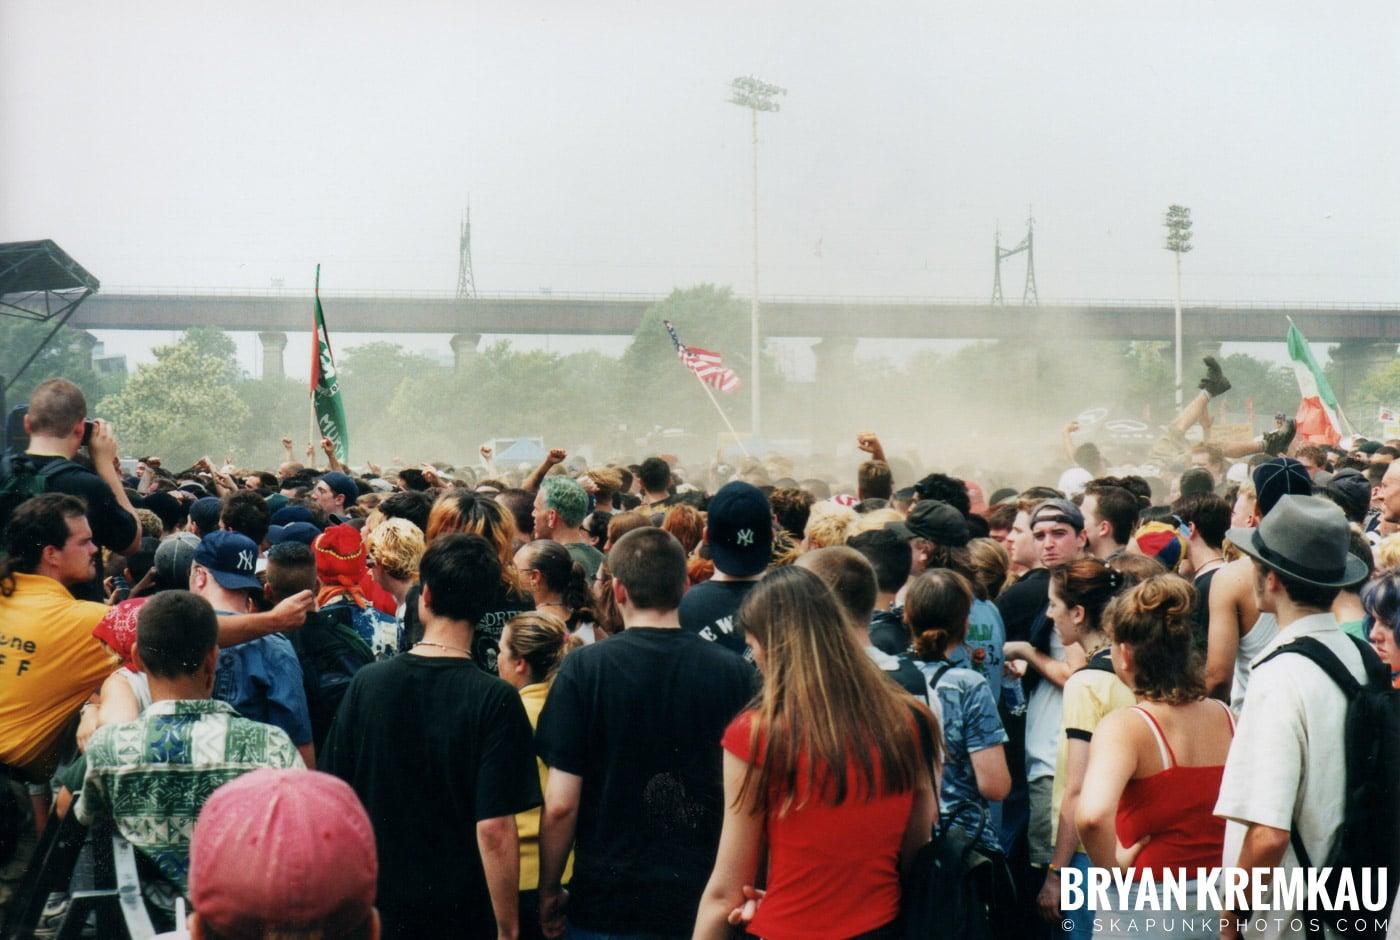 The Dropkick Murphys @ Vans Warped Tour, Randall's Island, NYC - 8.4.01 (13)